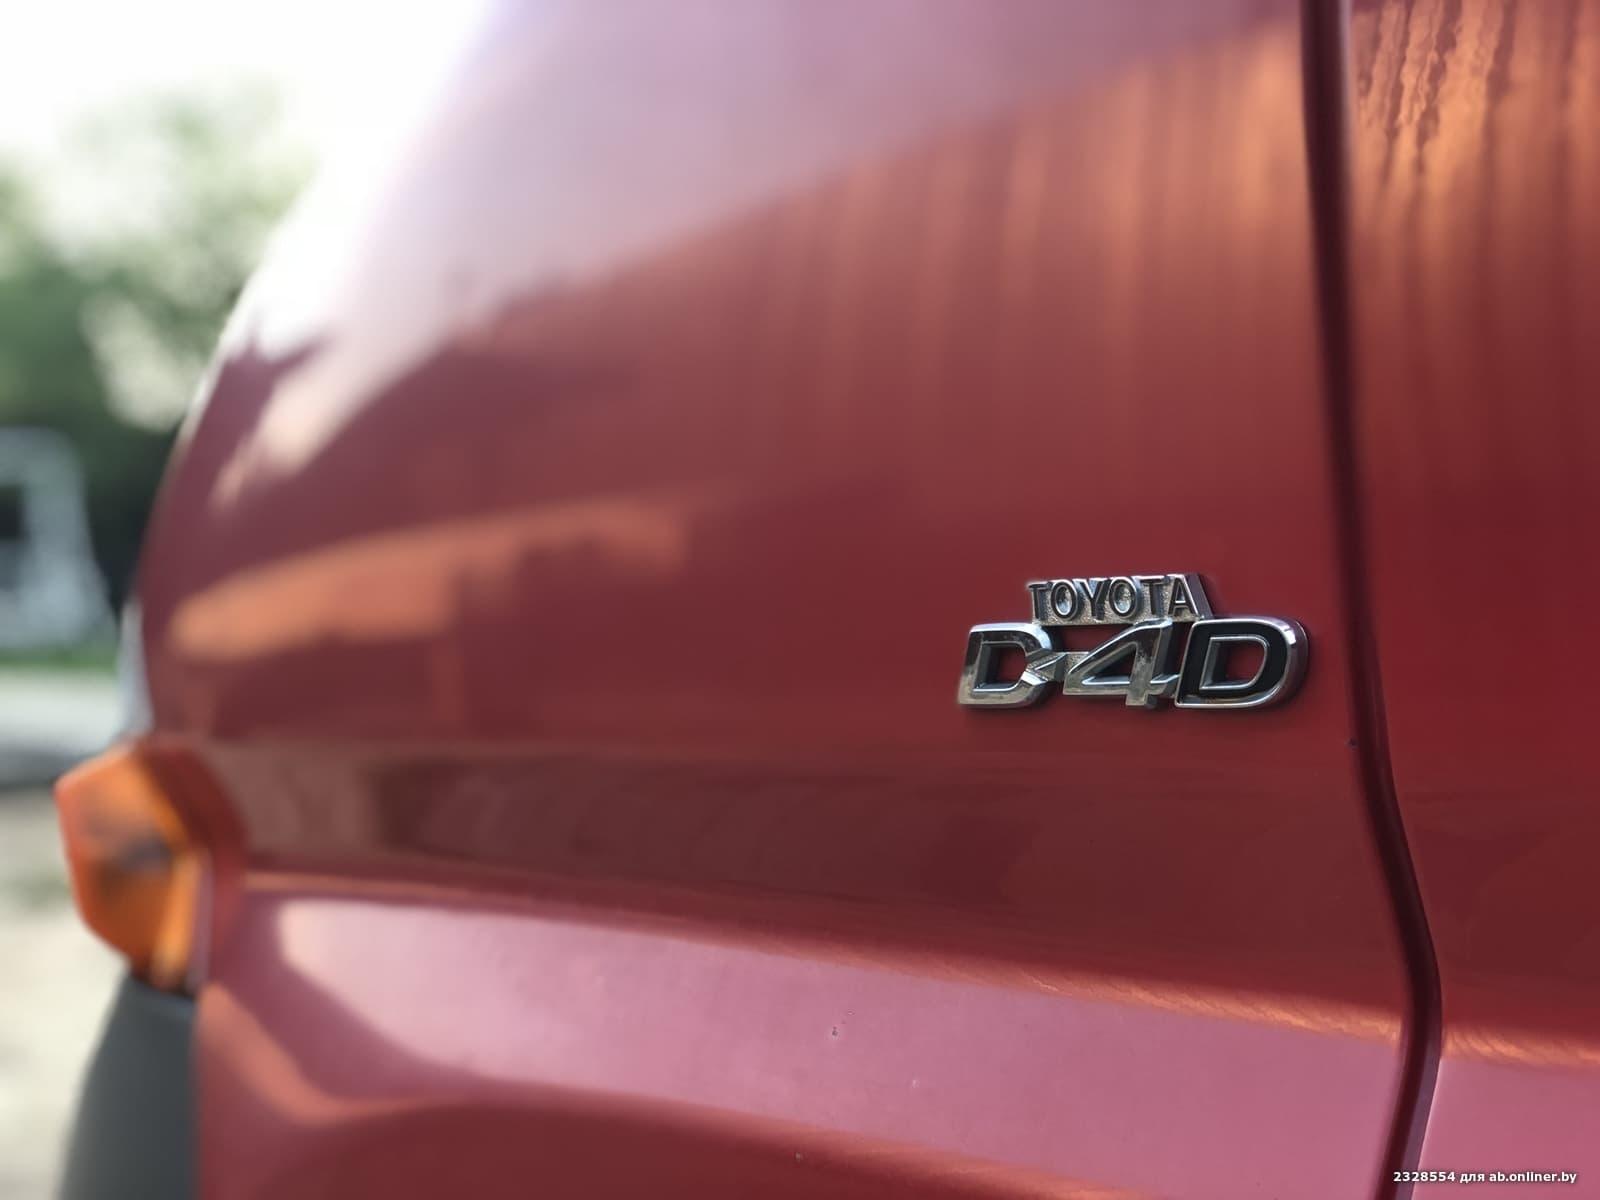 Toyota HiAce Long / 2.5 D-4D (102 Hp)